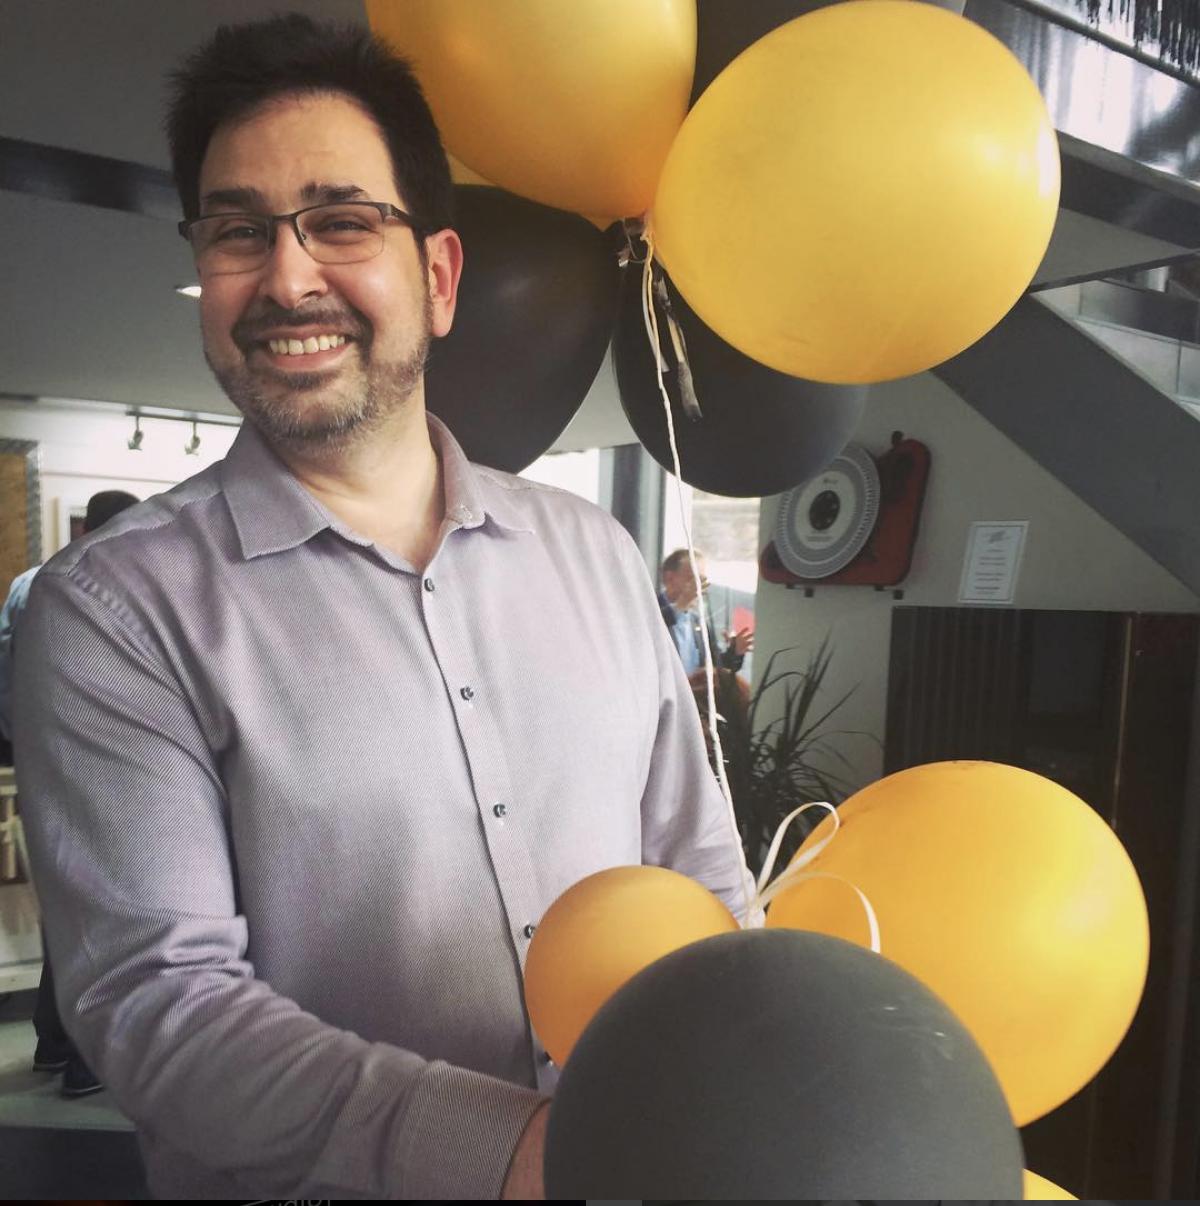 Audio-philia-hifi-shop-birthday-balloons